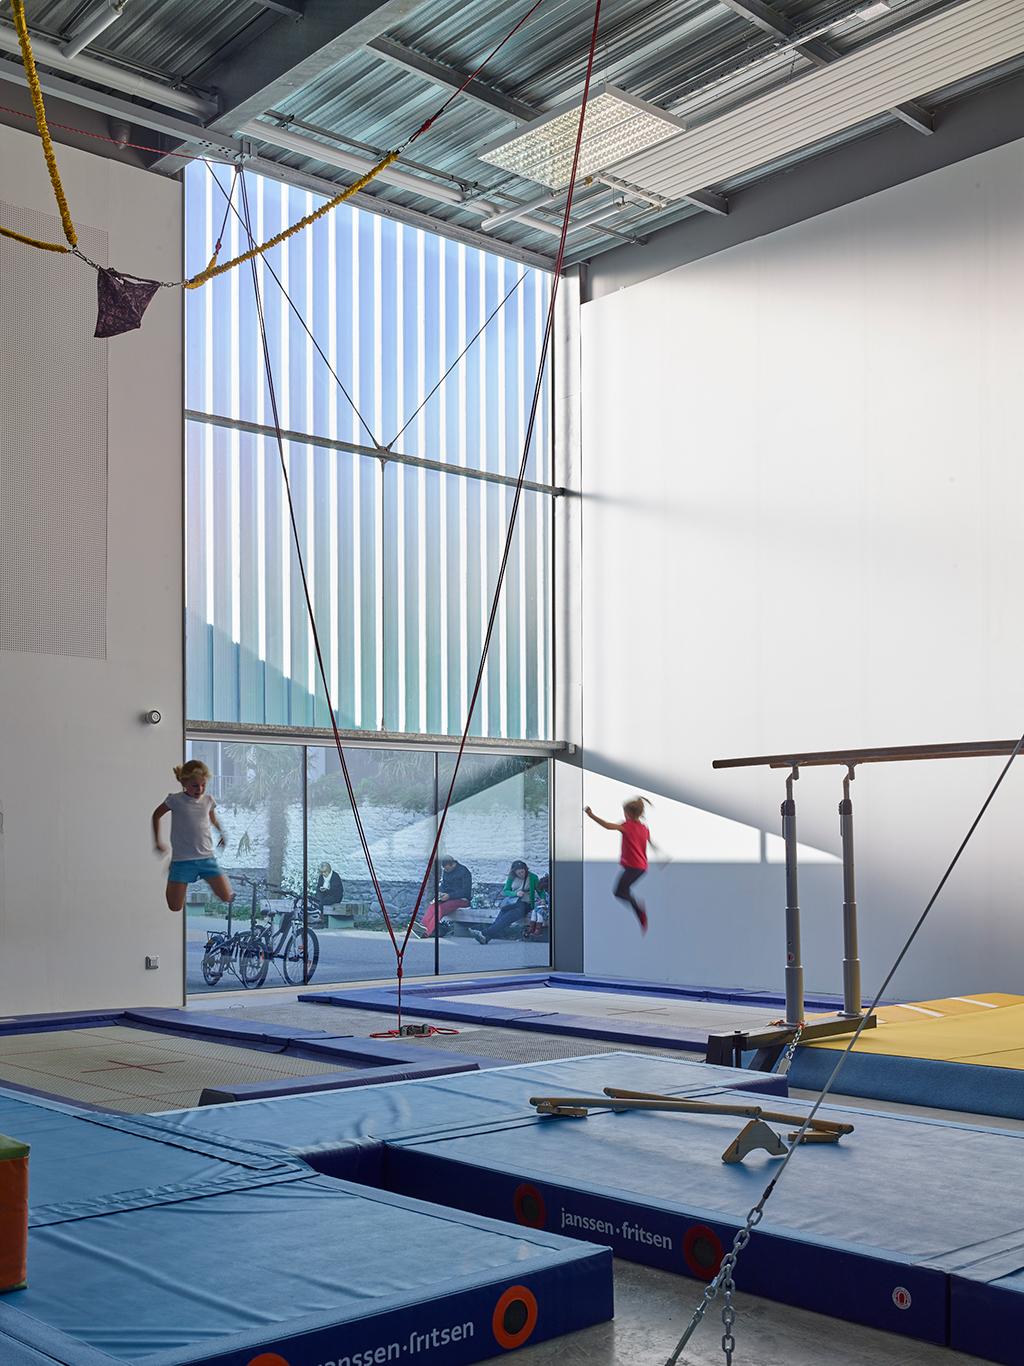 Cherbourg 08 - Salle de gymnastique – Cherbourg